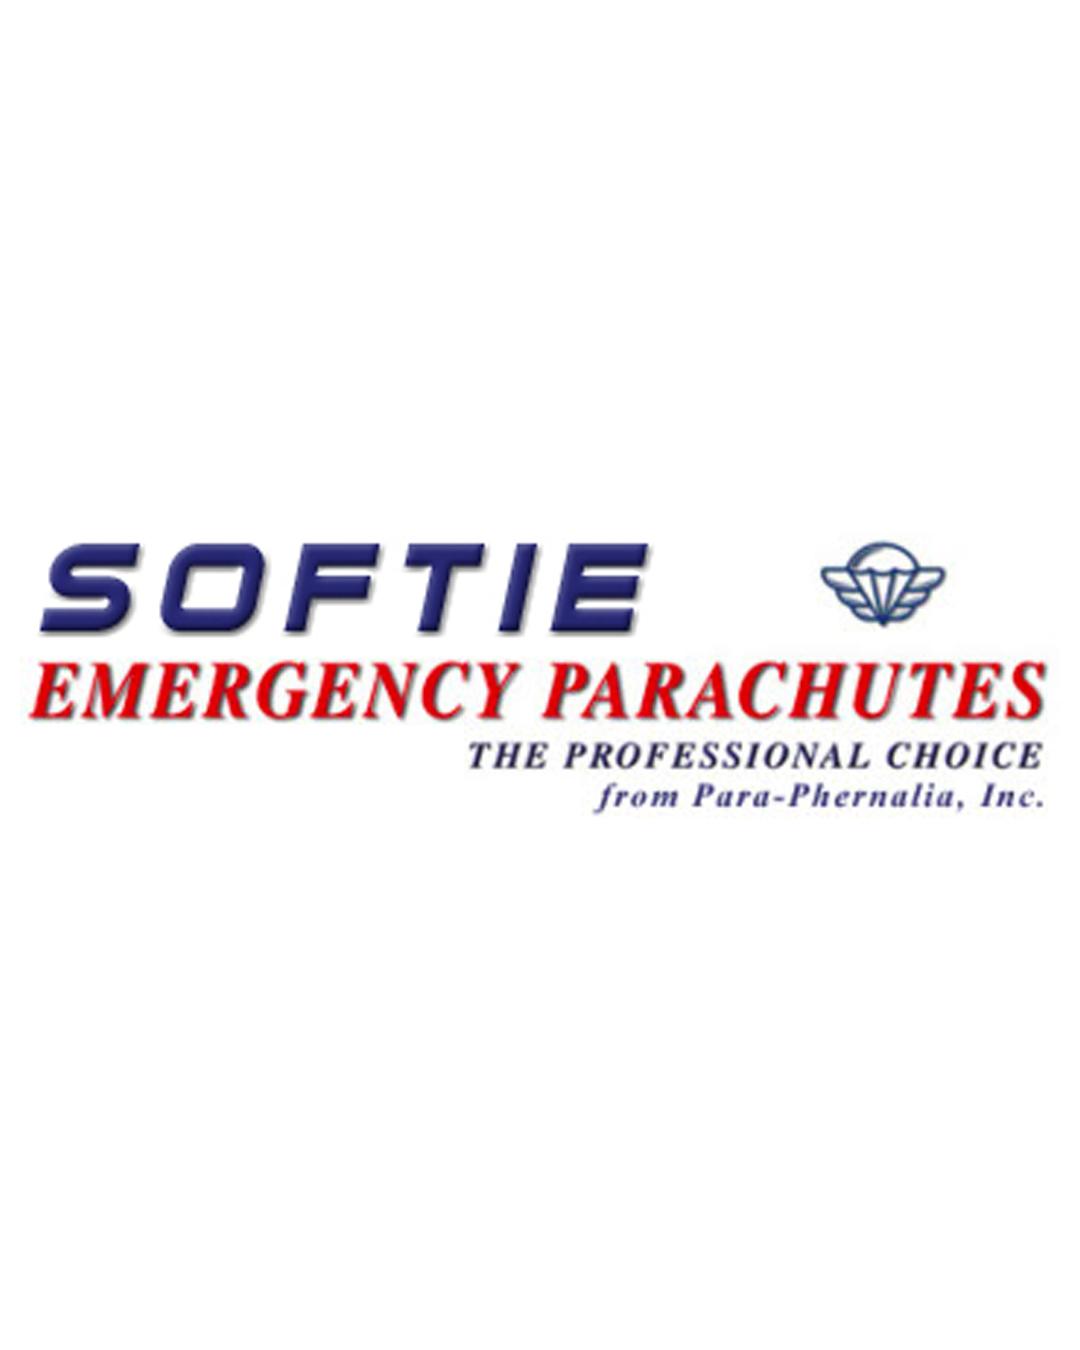 softie_parachutes.jpg